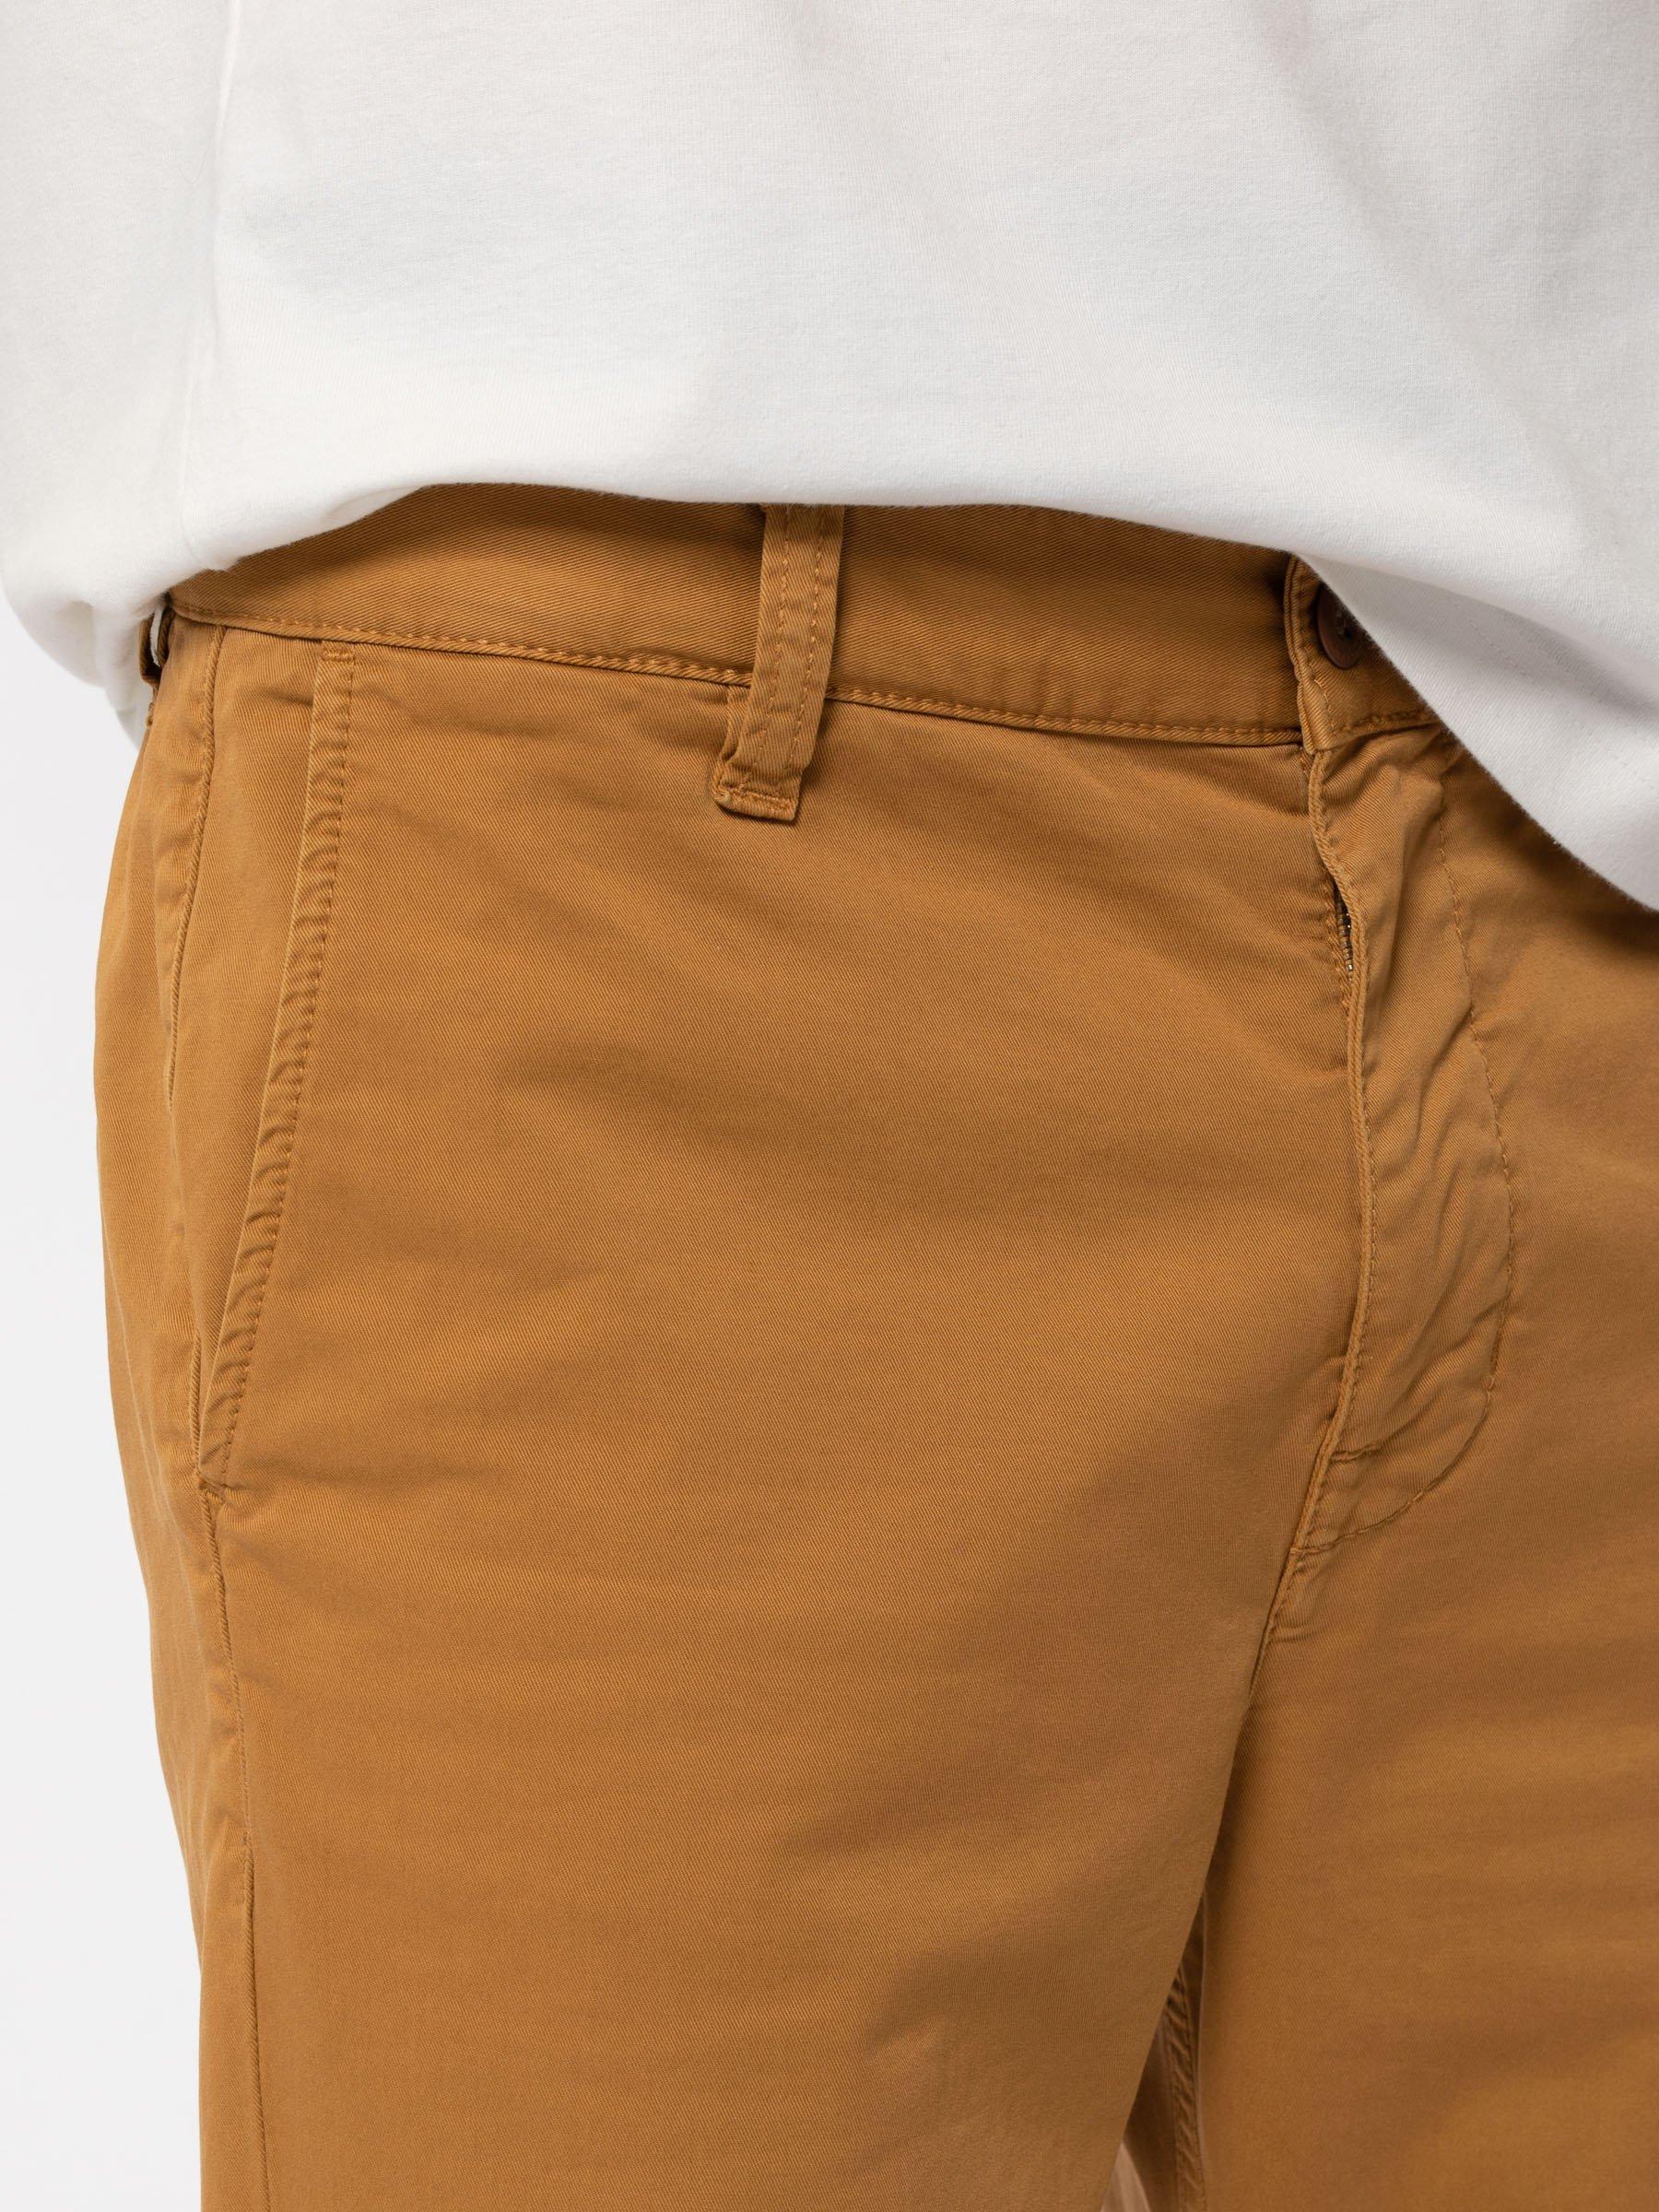 mespromenades-le-pantalon-dautmne-nudie-jeans-Easy-Alvin-Camel-120168-14_dhHBbx2_2400x2400